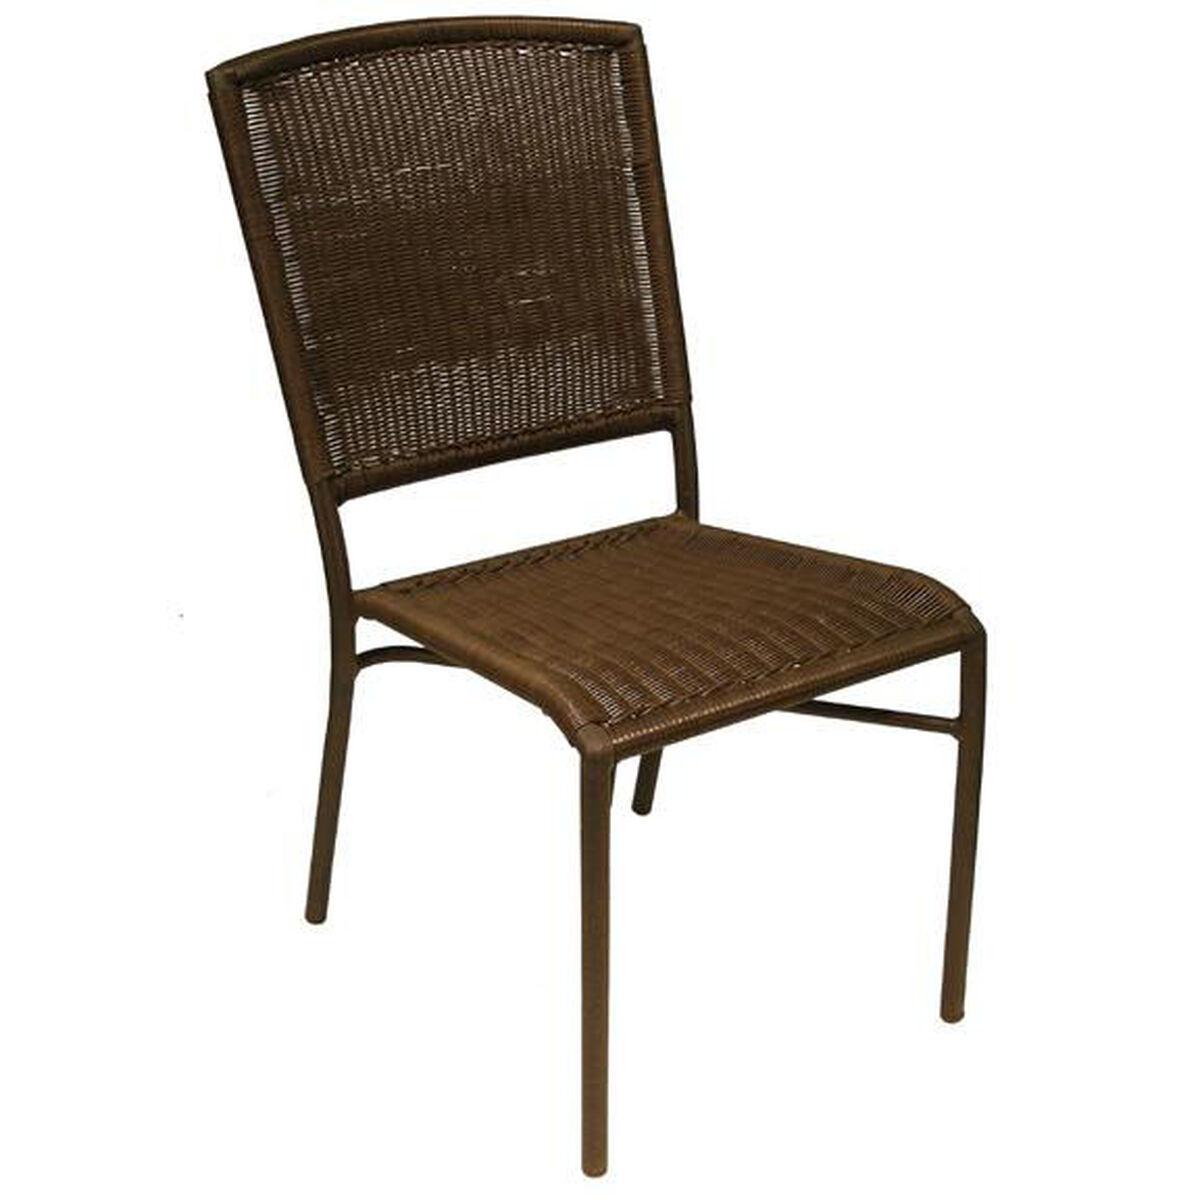 aluminum stackable side chair c004 e. Black Bedroom Furniture Sets. Home Design Ideas